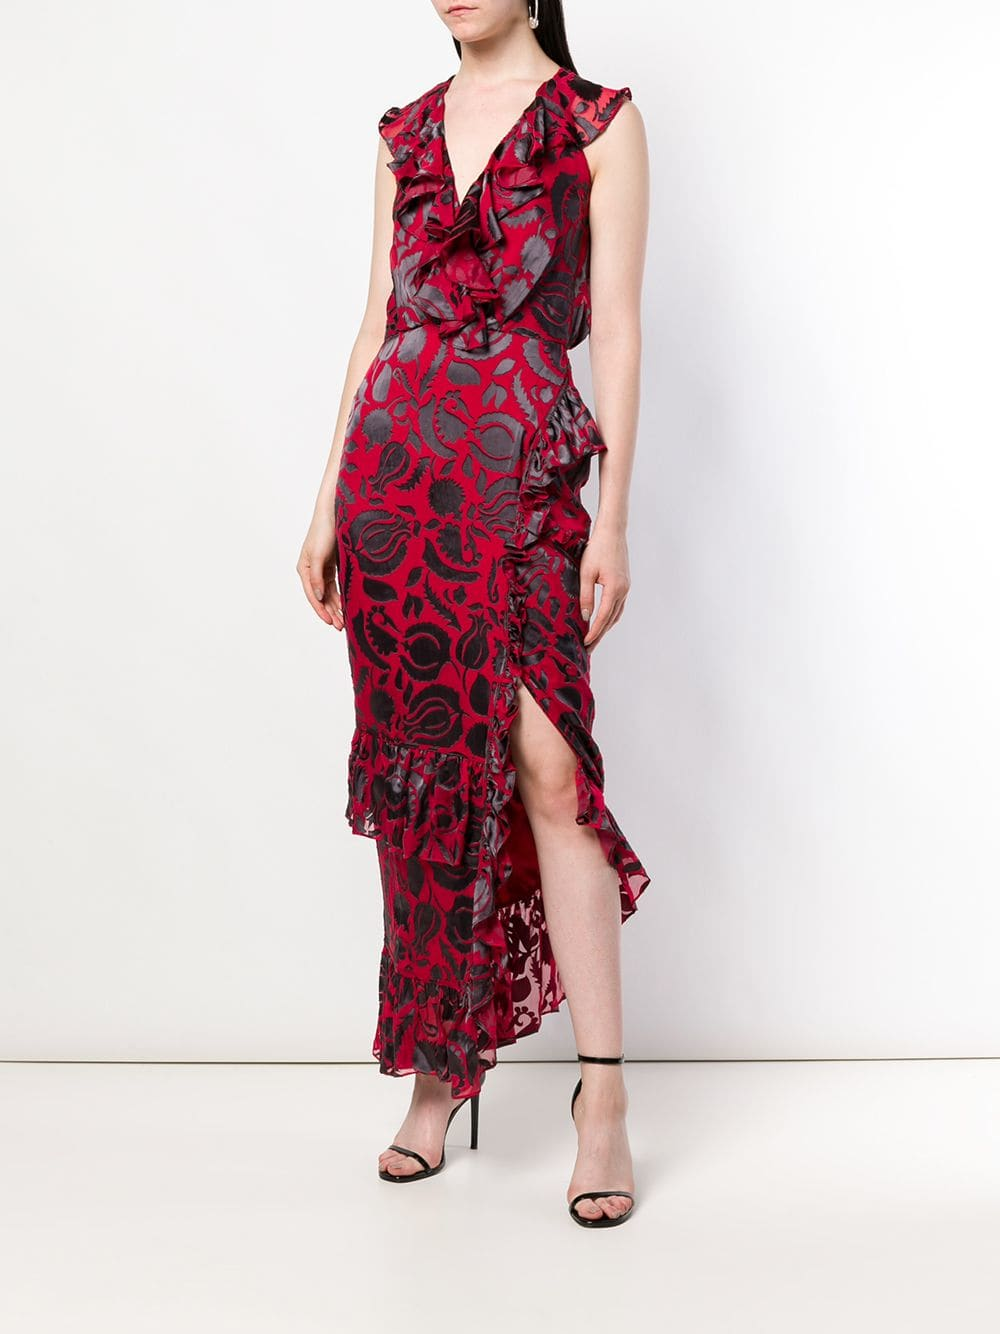 SALONI Anita Ruffle Red / Floral Printed Dress